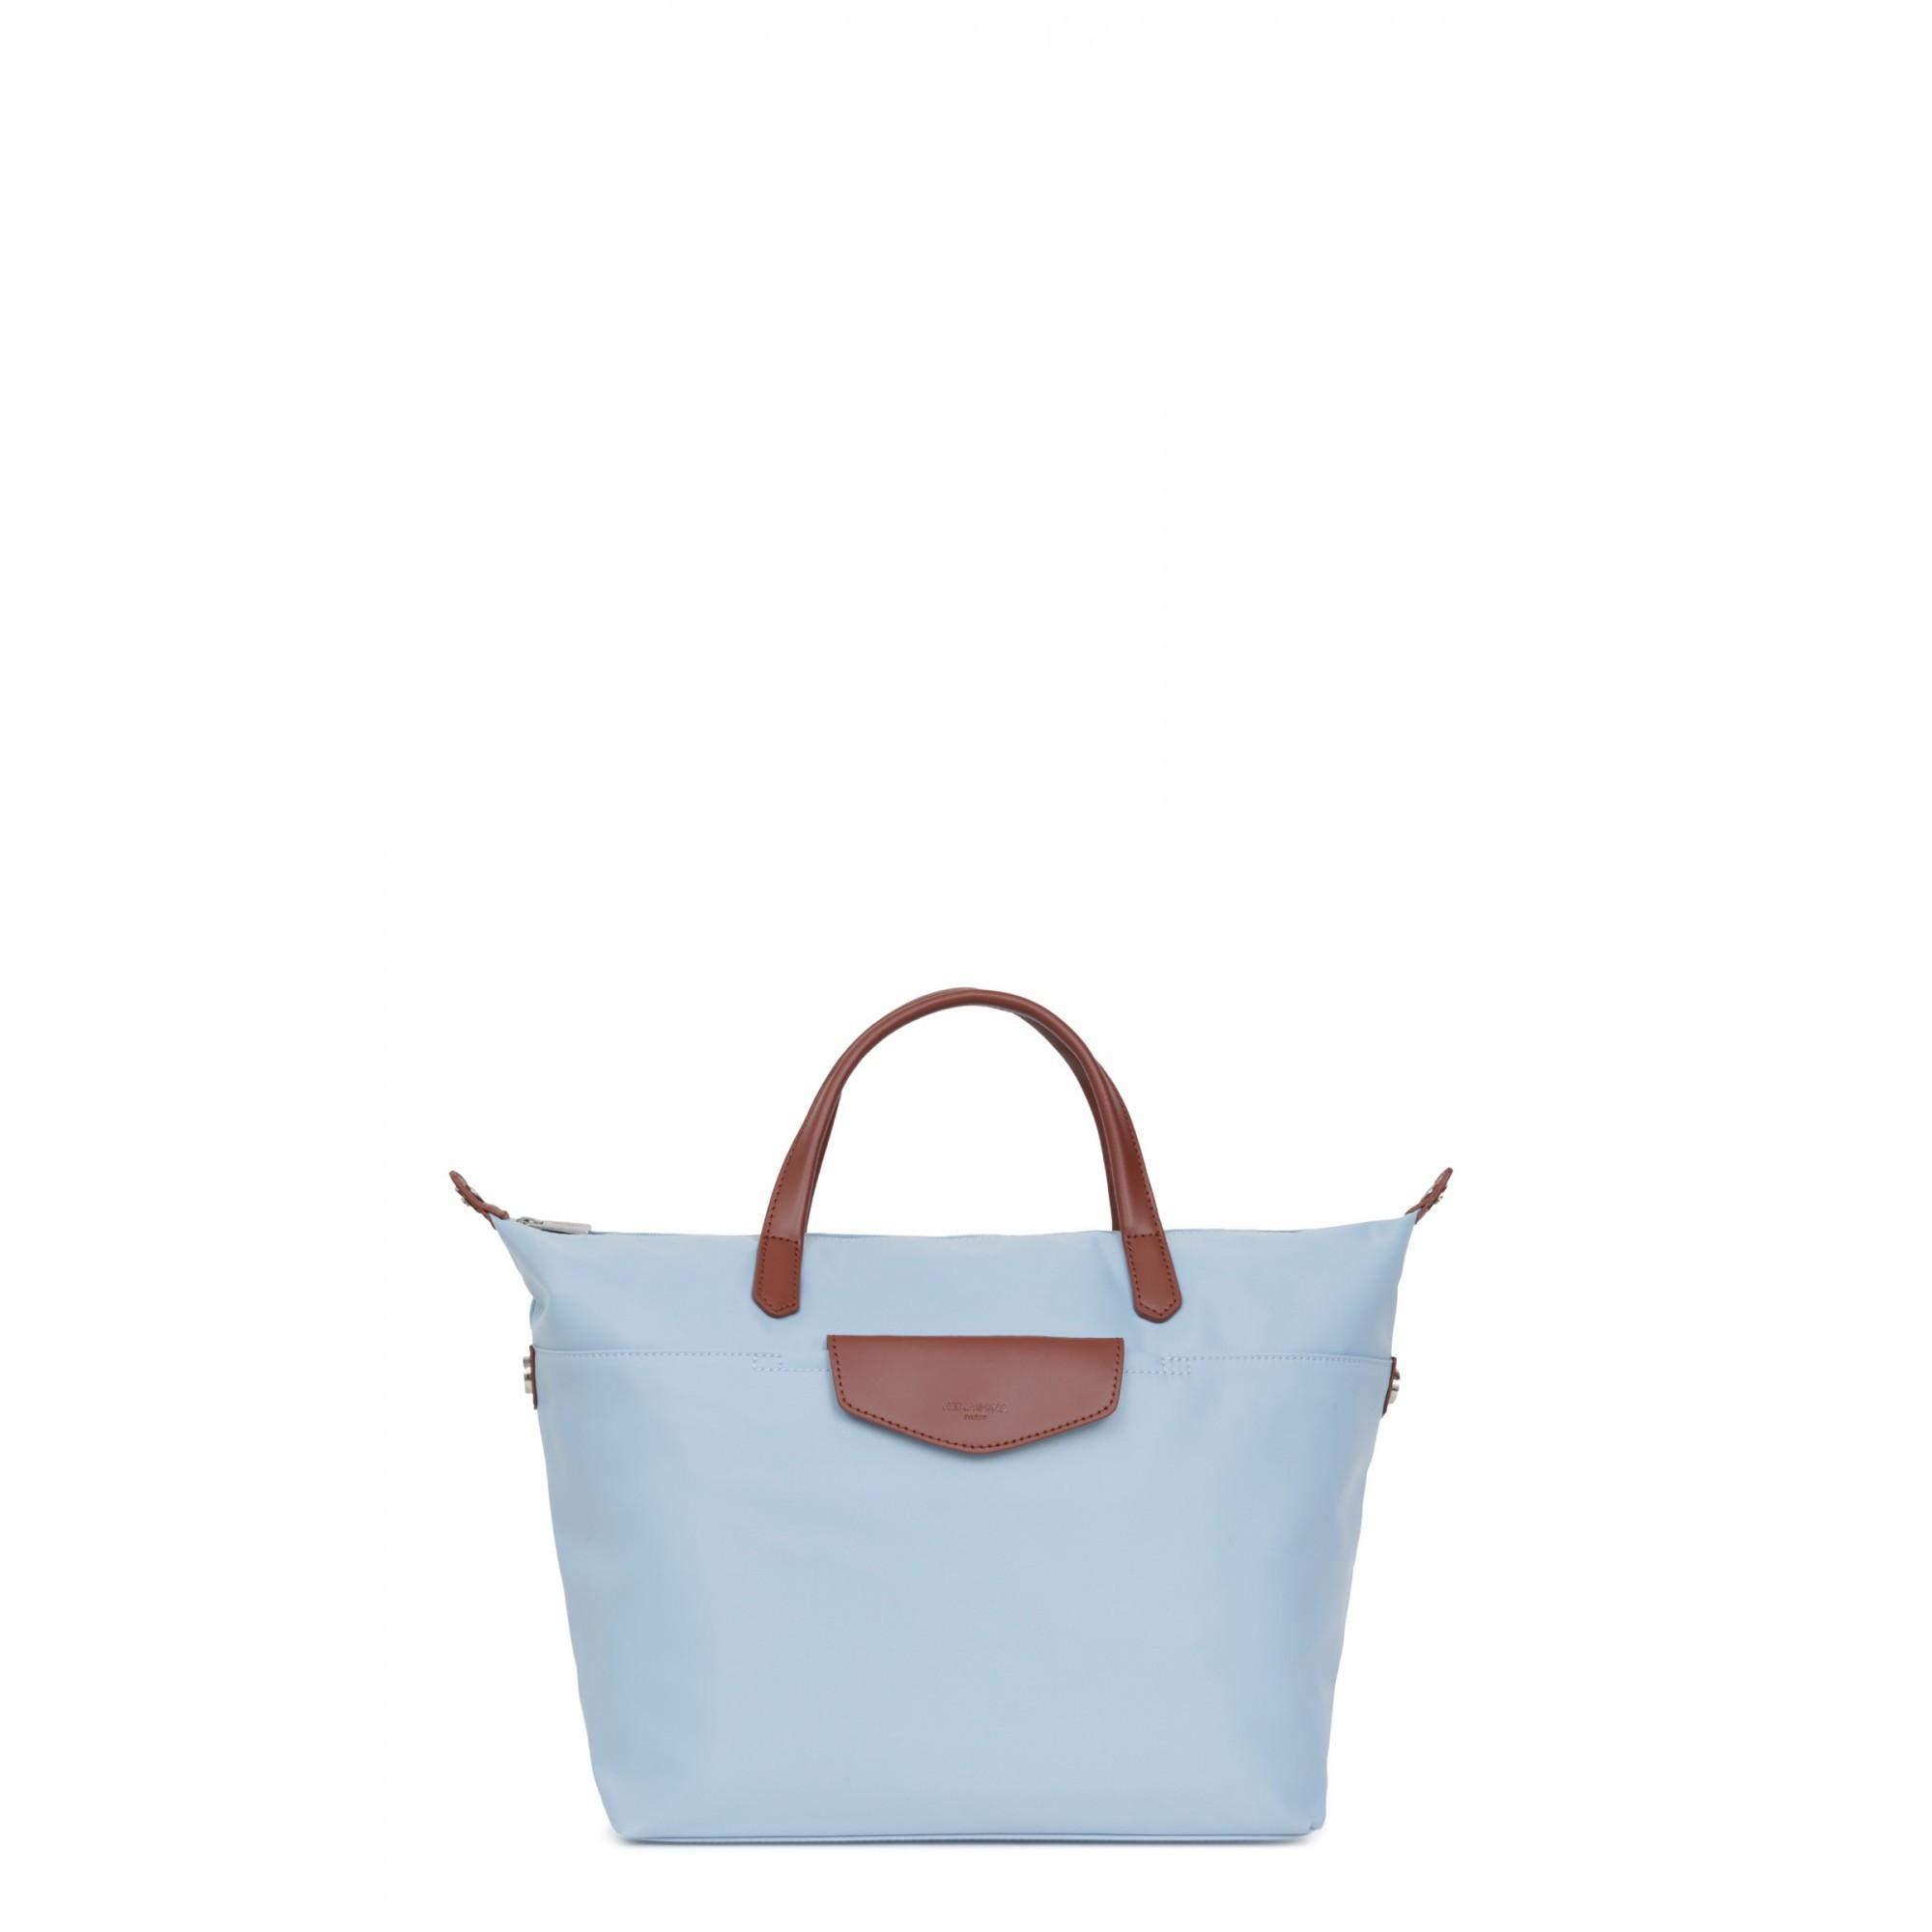 Hexagona Pop 176575 - Sky blue-brąz